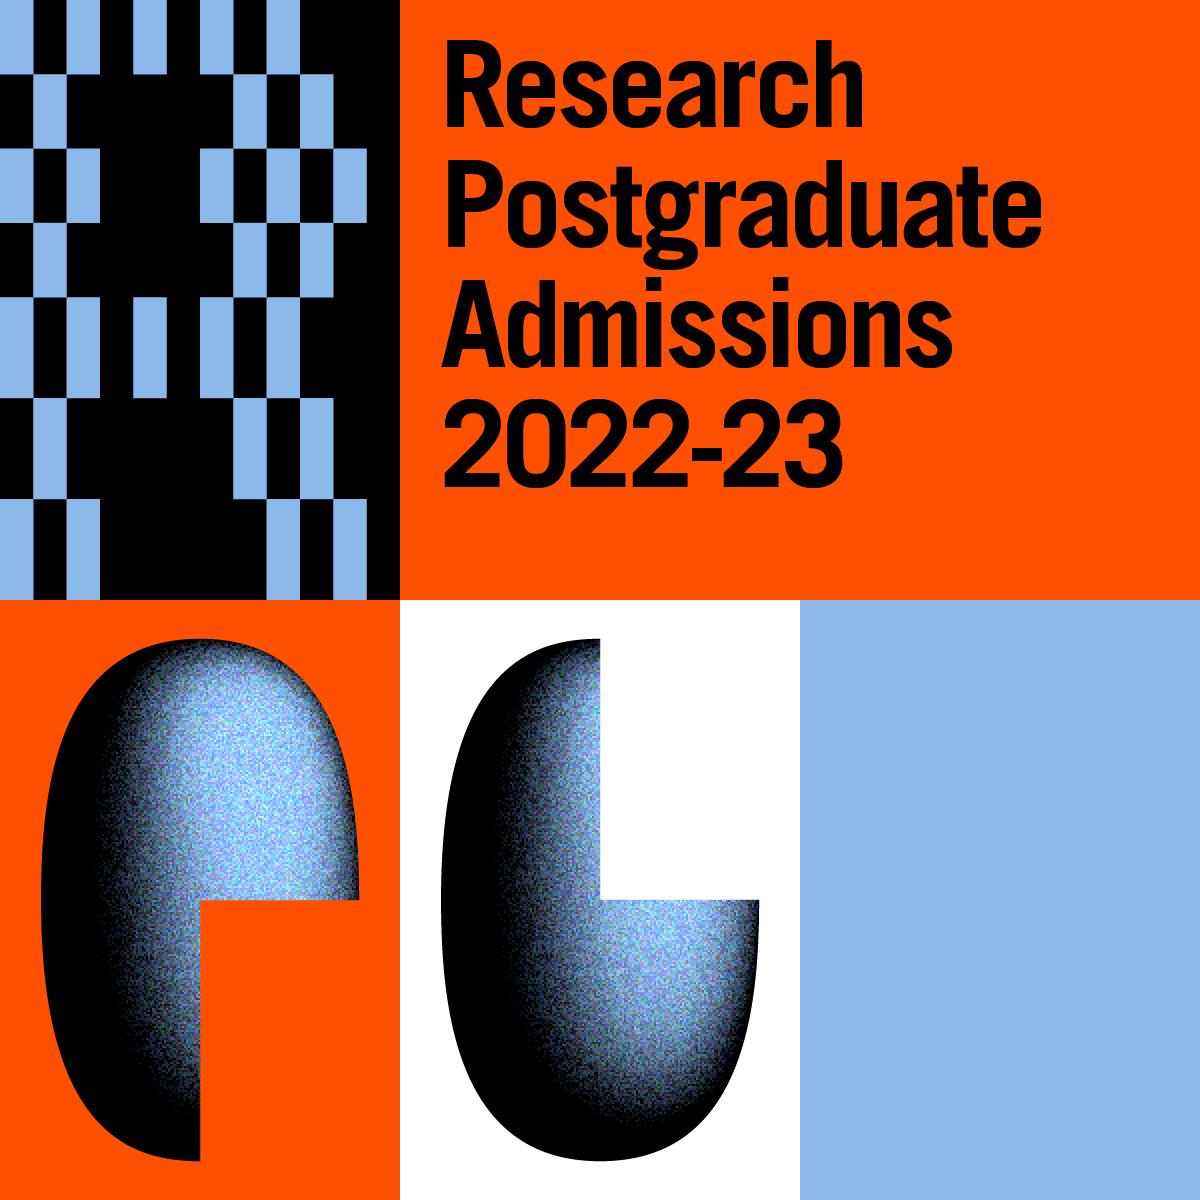 Research Postgraduate Admissions 2022-23